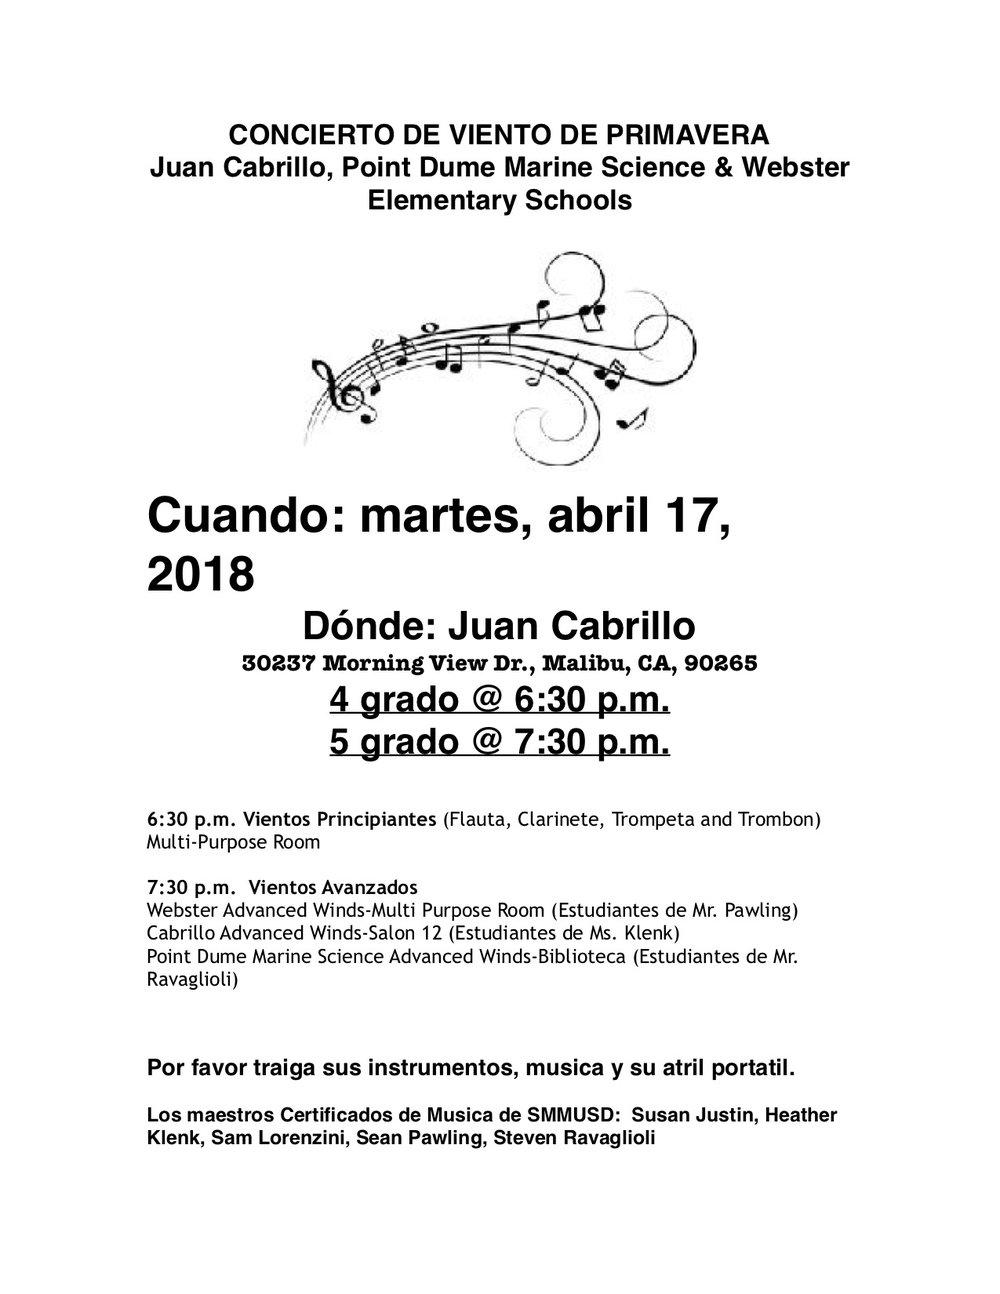 SPRING CONCERT Memo 4-2018 Spanish.jpg